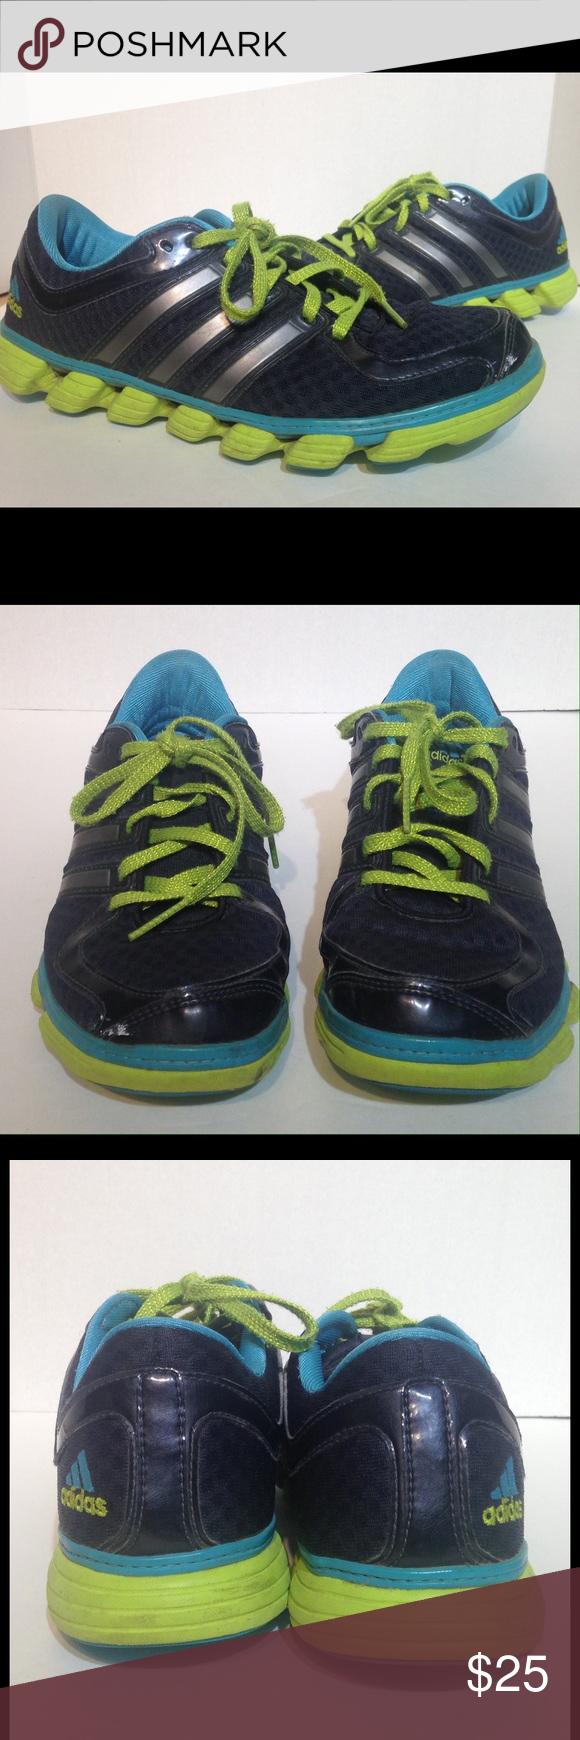 Adidas Liquid Ride | Running Shoes tamaño tamaño Adidas 8 | 82fb196 - temperaturamning.website